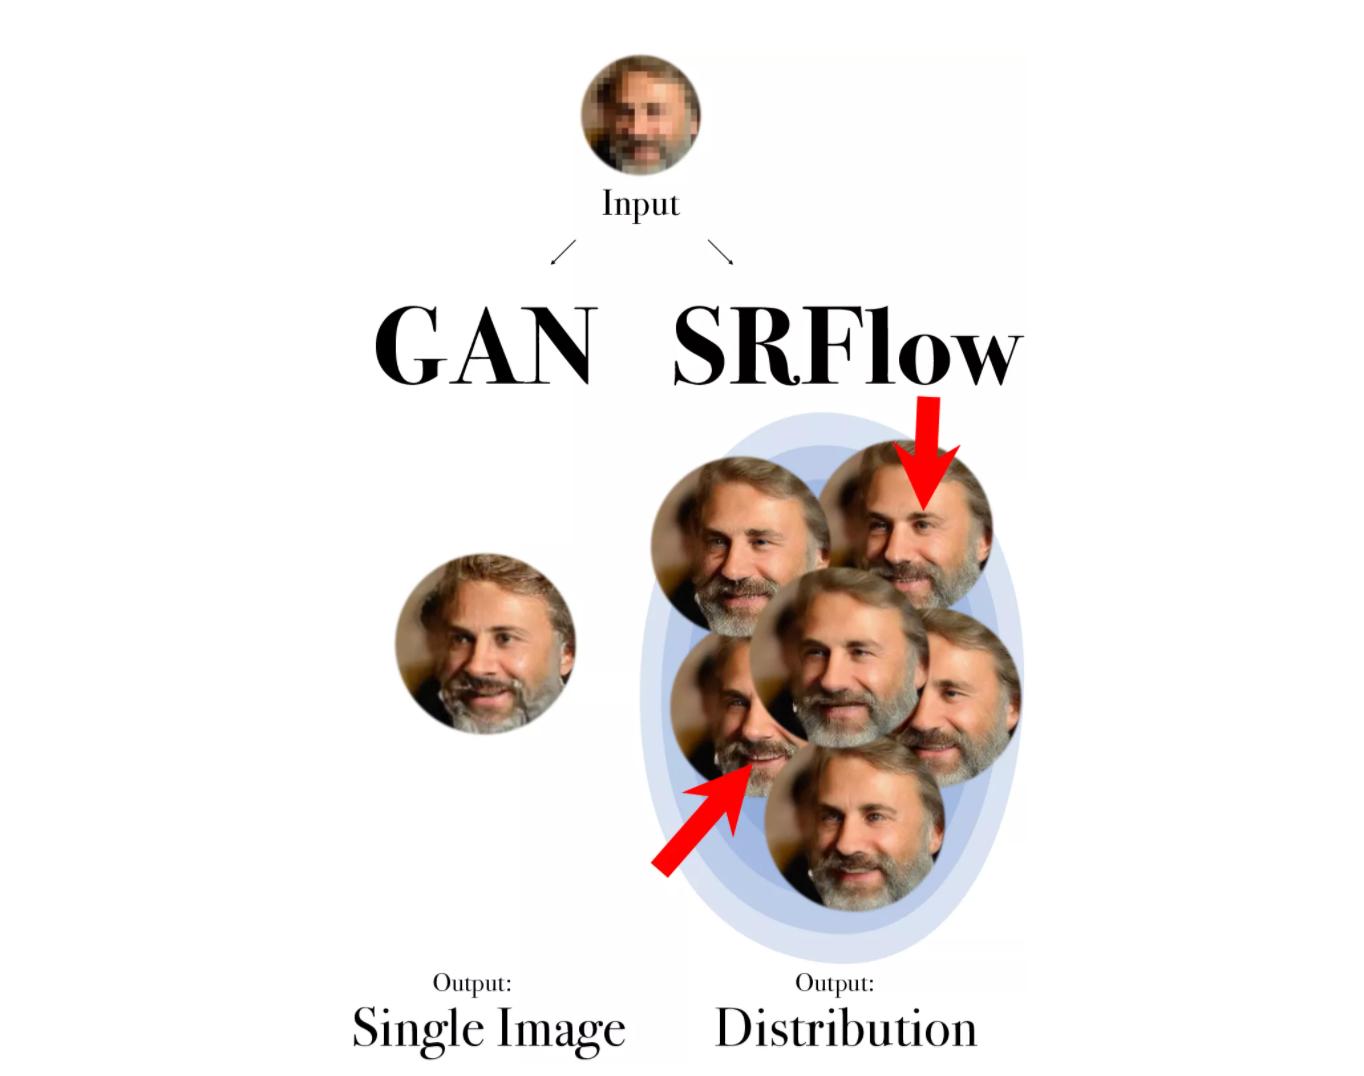 ECCV 2020   这个模型的脑补能力比GAN更强,ETH提出新型超分辨率模型SRFlow